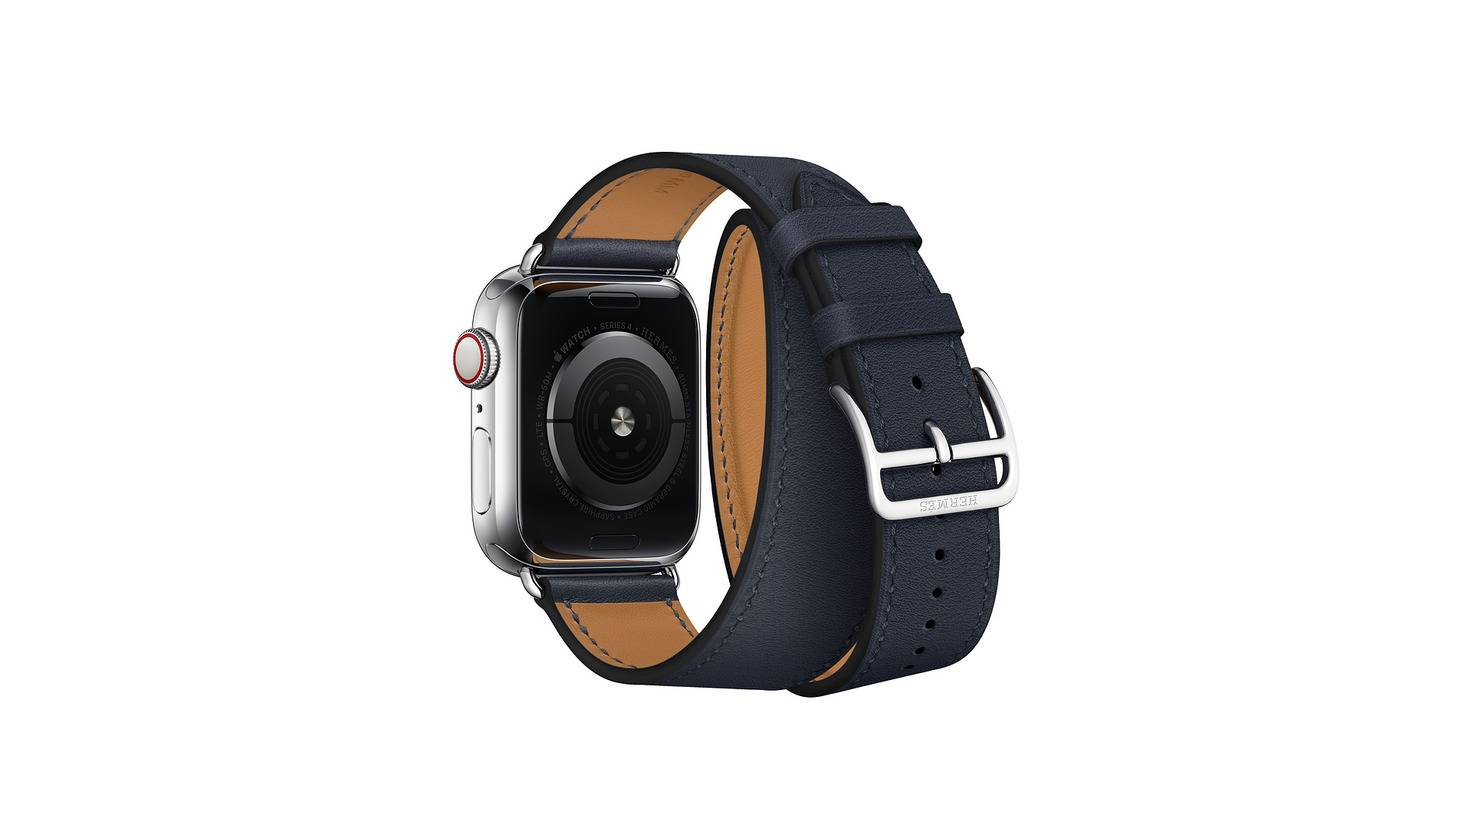 Apple-Watch-Hermes-Lederarmband-Double